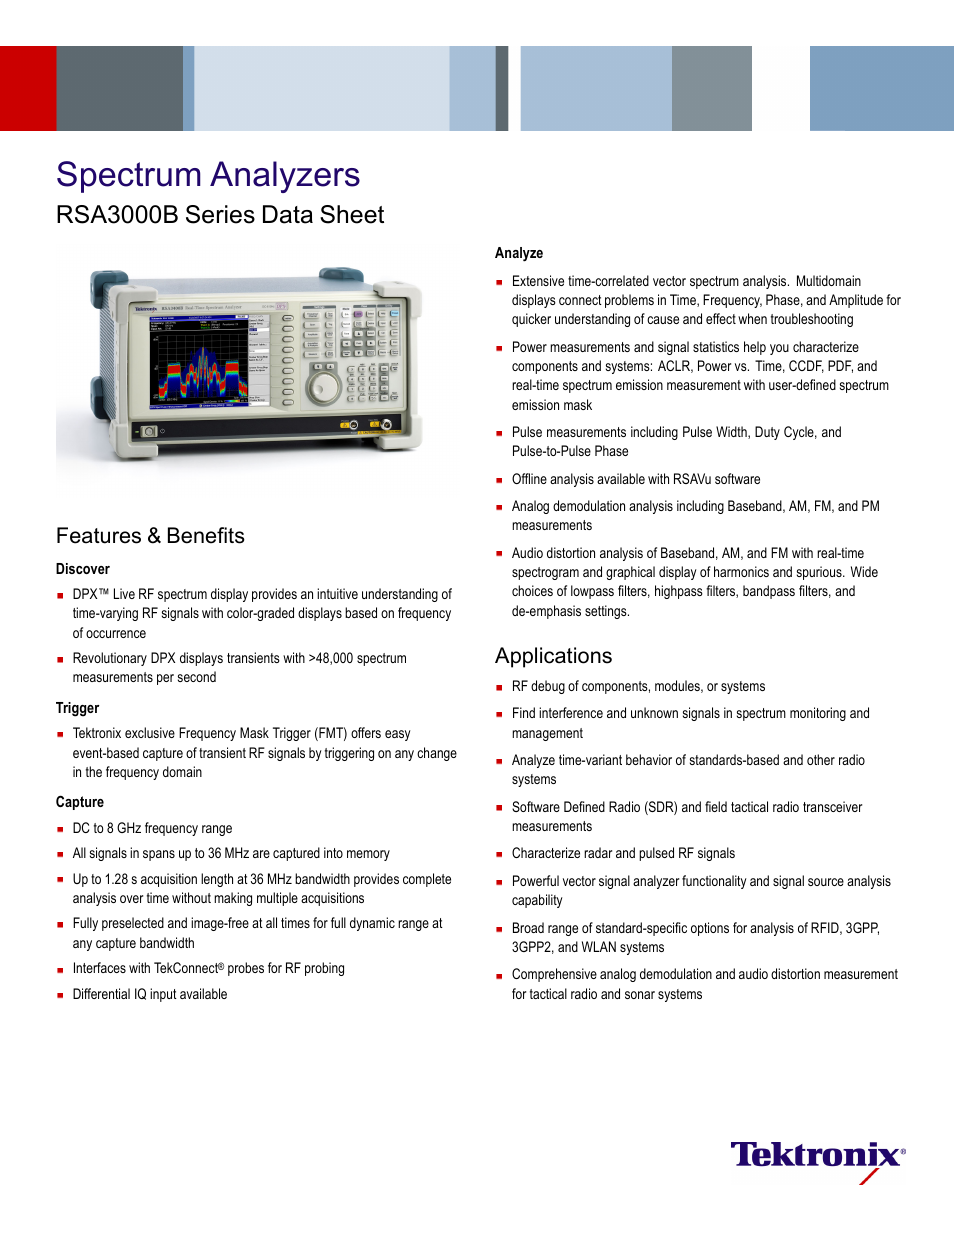 Atec Tektronix-RSA3000B User Manual | 16 pages